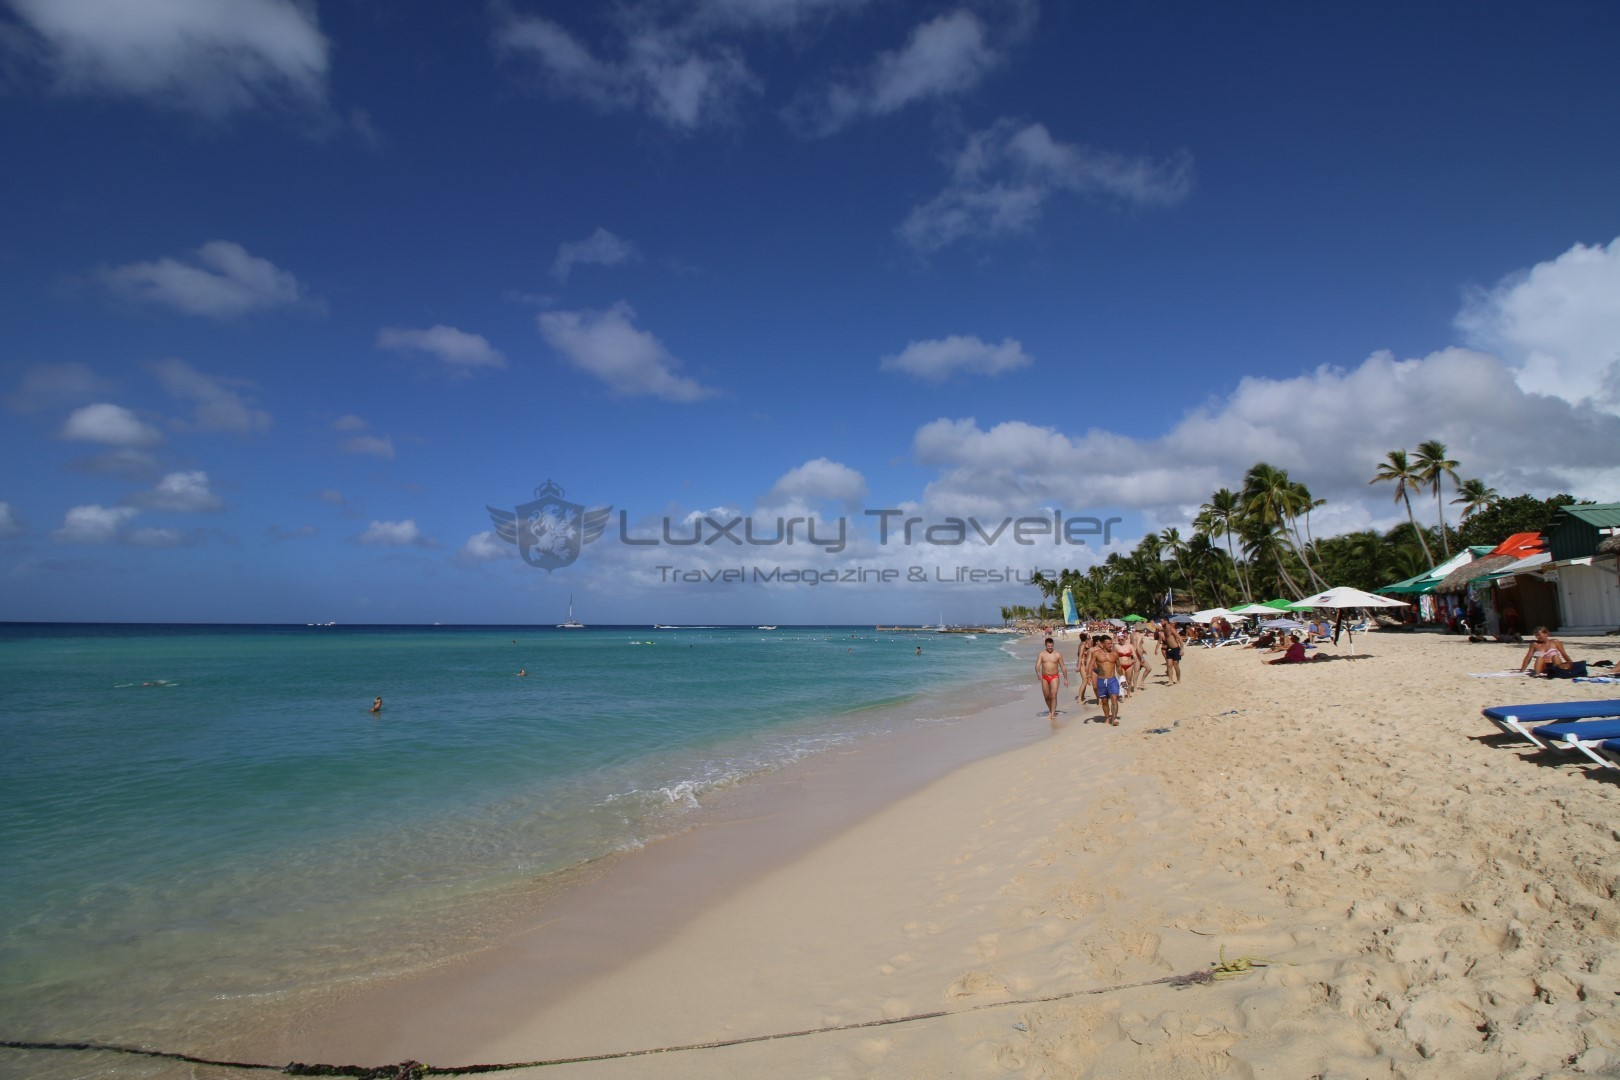 Iberostar_Hacienda_Dominicus_Republica_Dominicana_Hotel_Isla_Saona